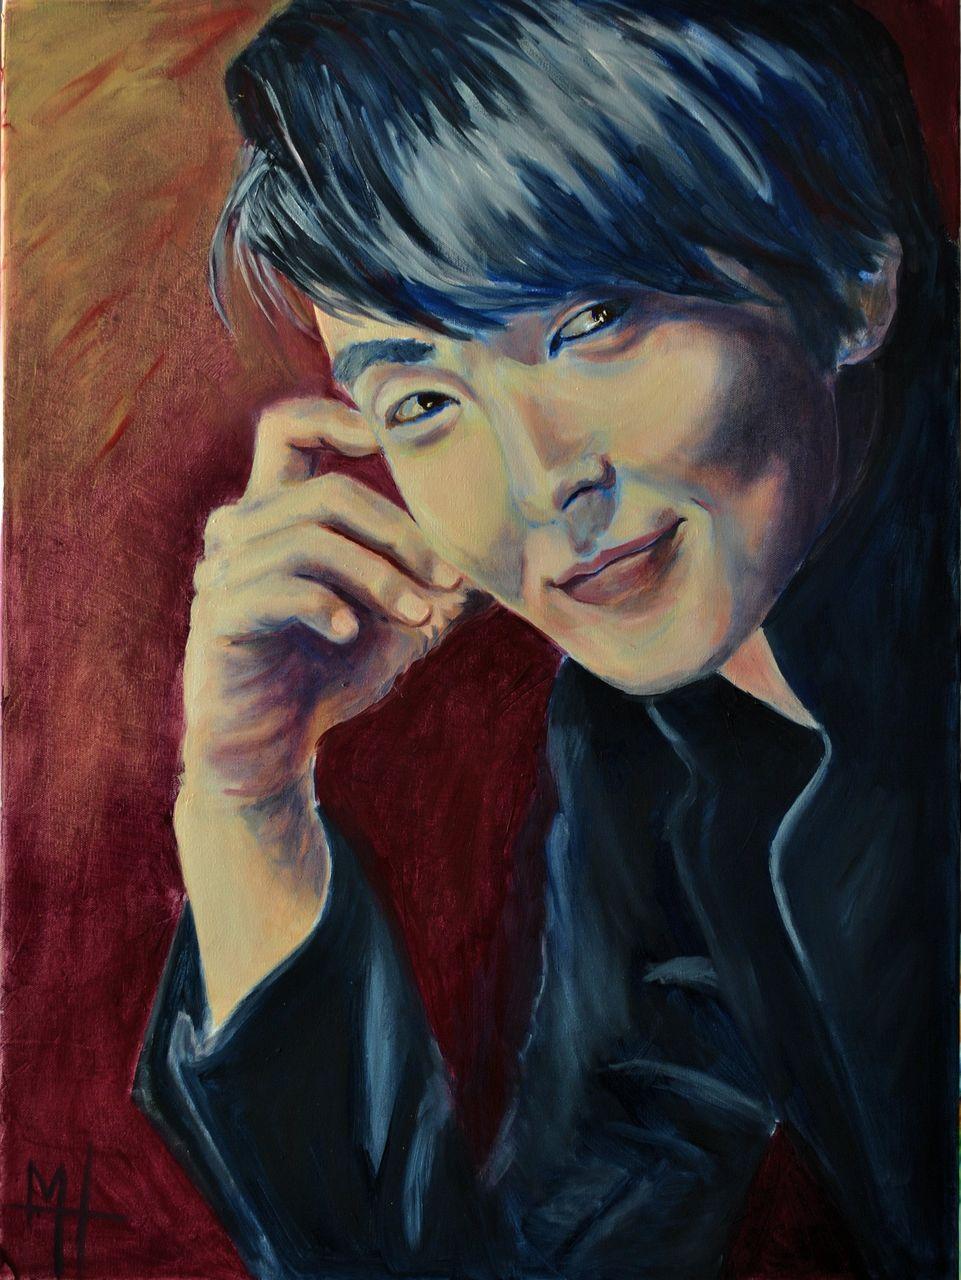 Marie-Hélène CLINCHAMPS Lee Jun Ki